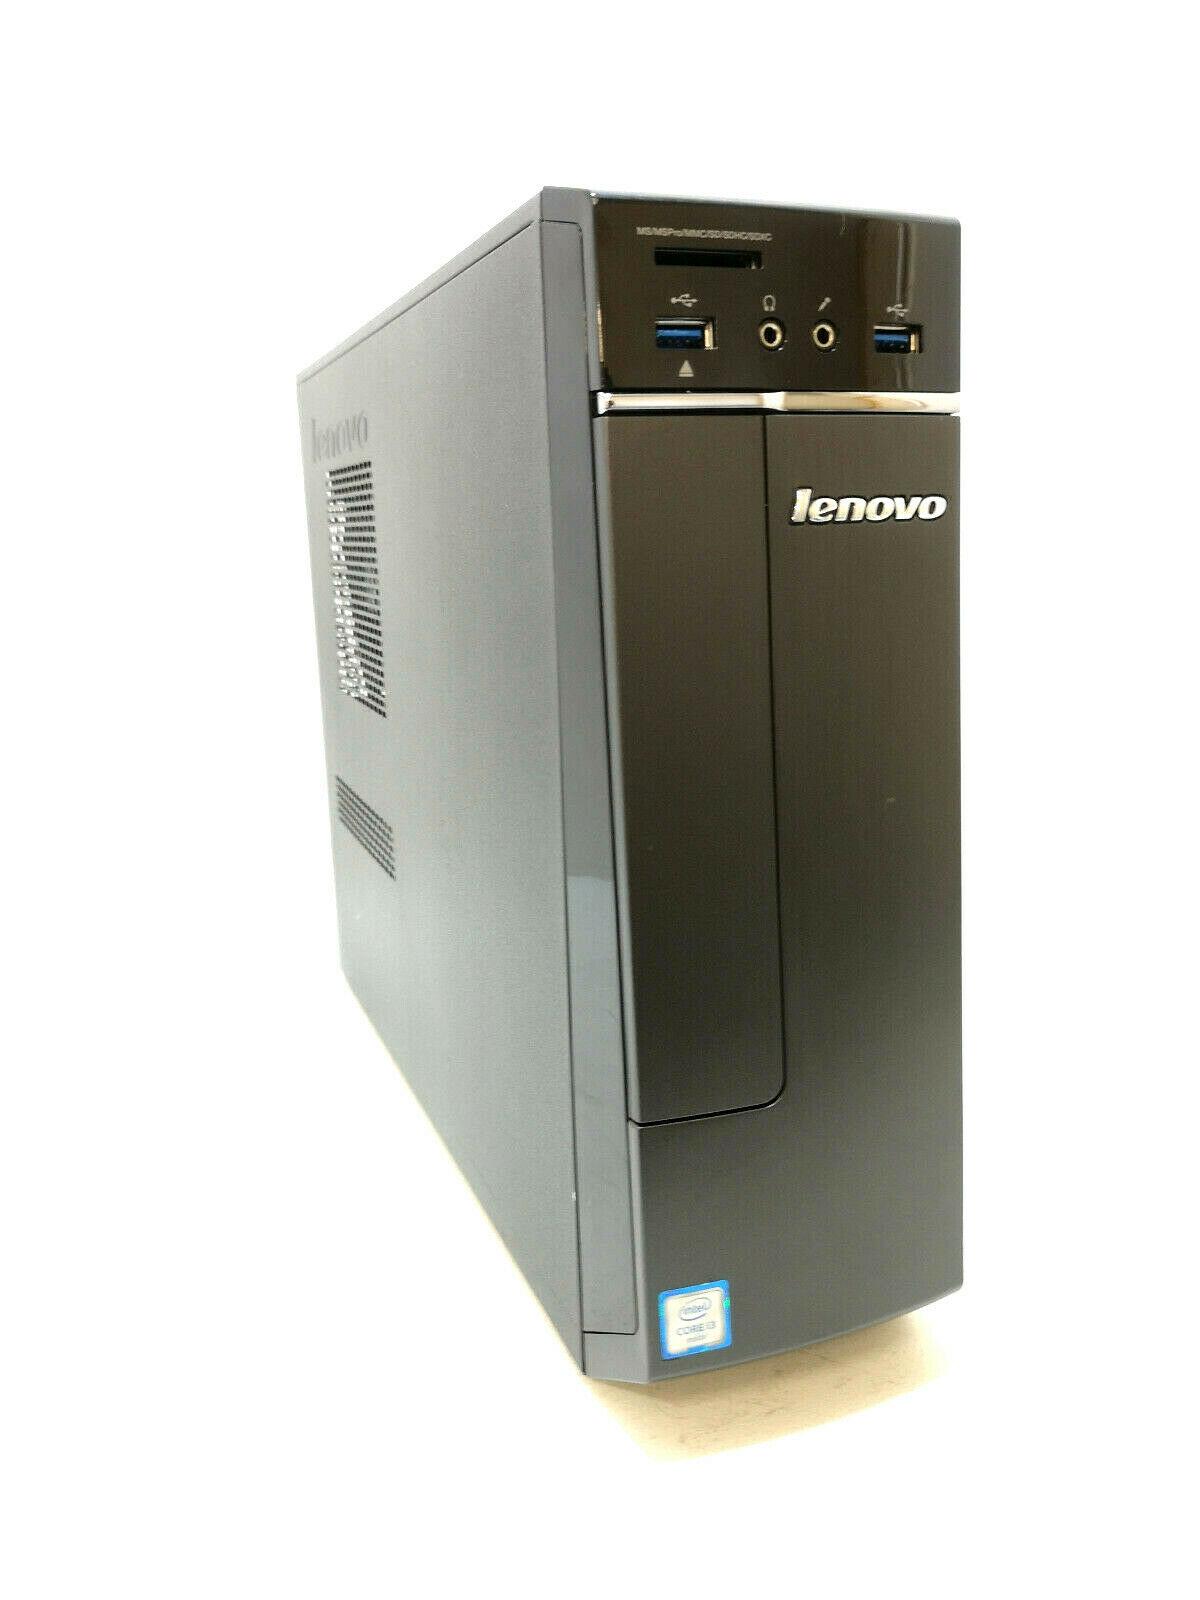 Lenovo-IdeaCentre-300S - 145956